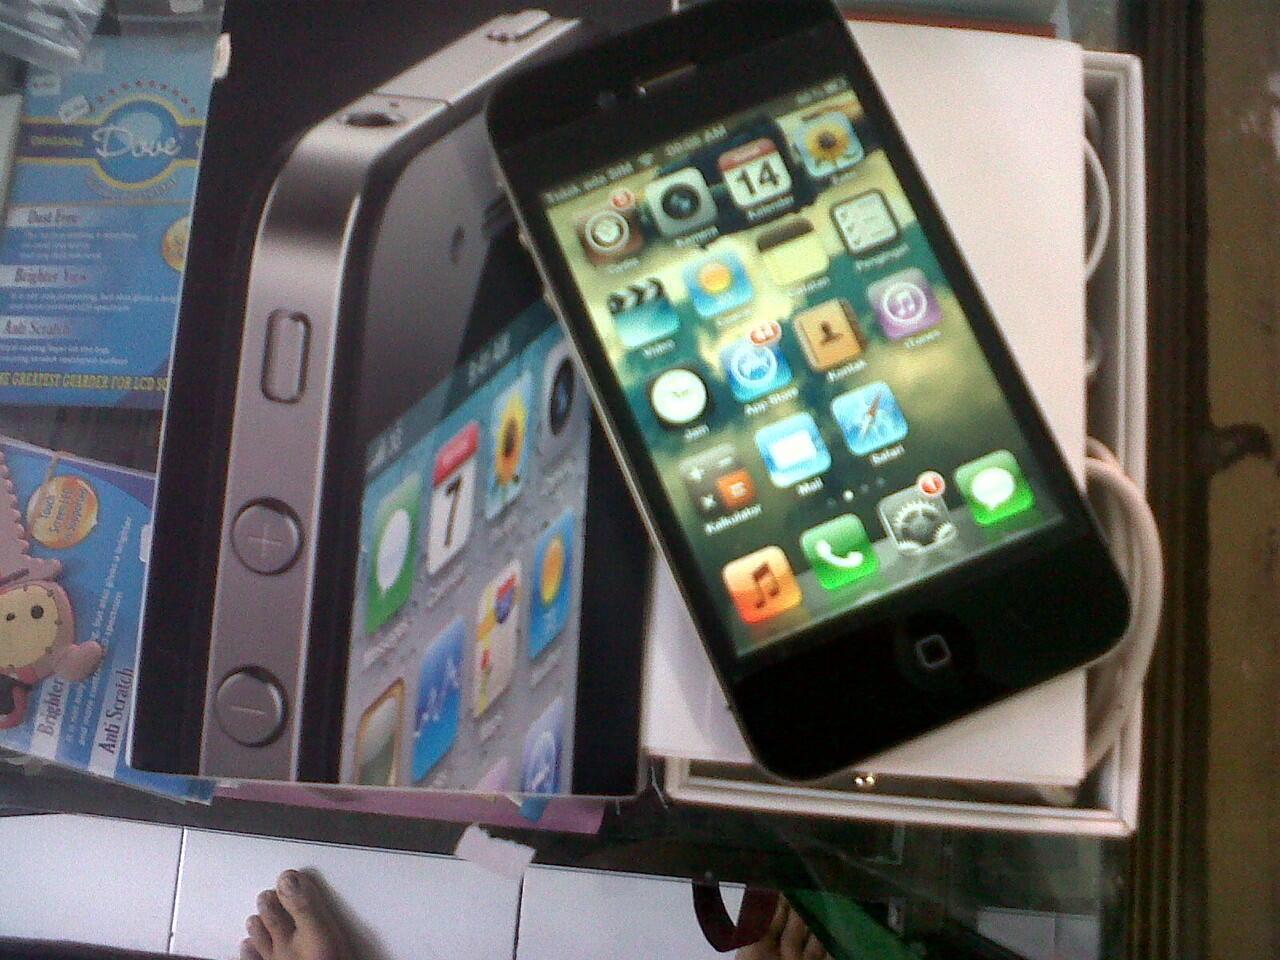 iphone 4 32gb black FU mulus fulset Rp. 4,2 nett